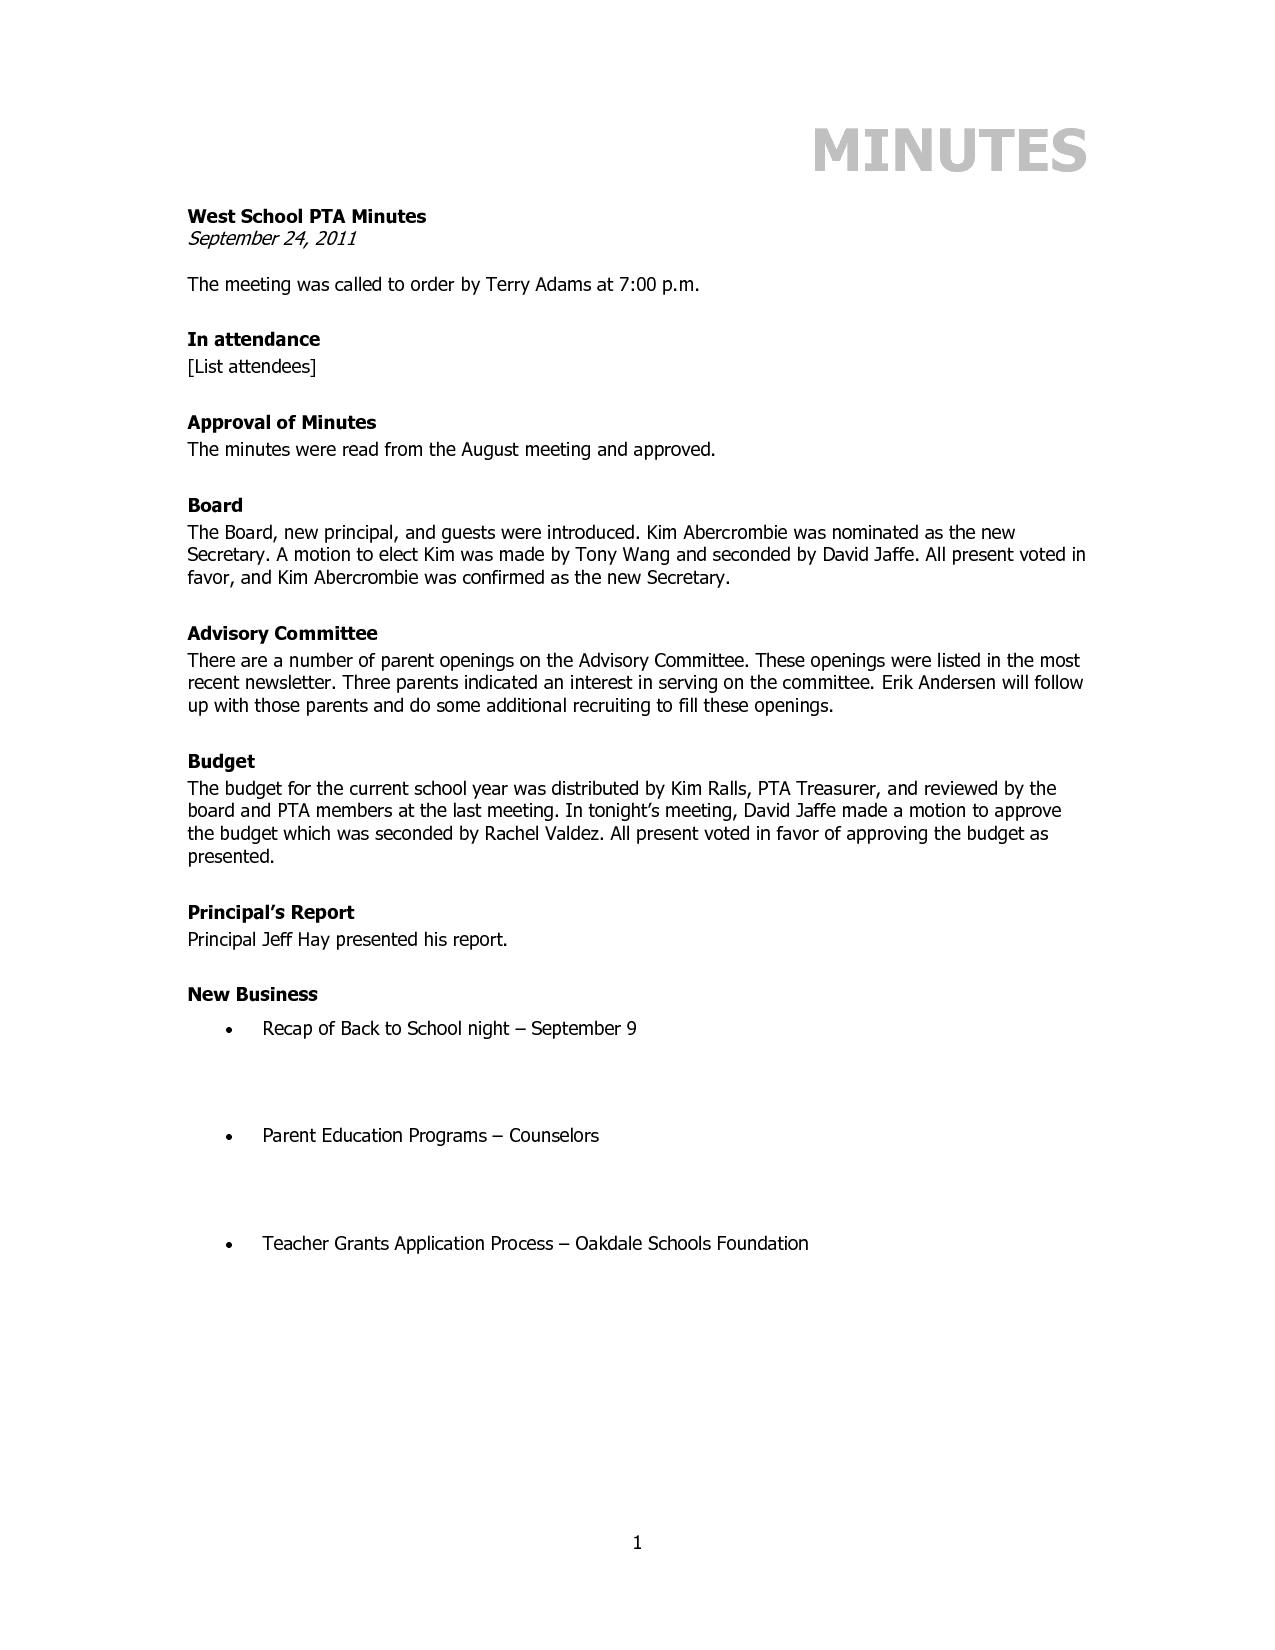 pto minutes template | Pta Minutes Template - Invitation Templates ...